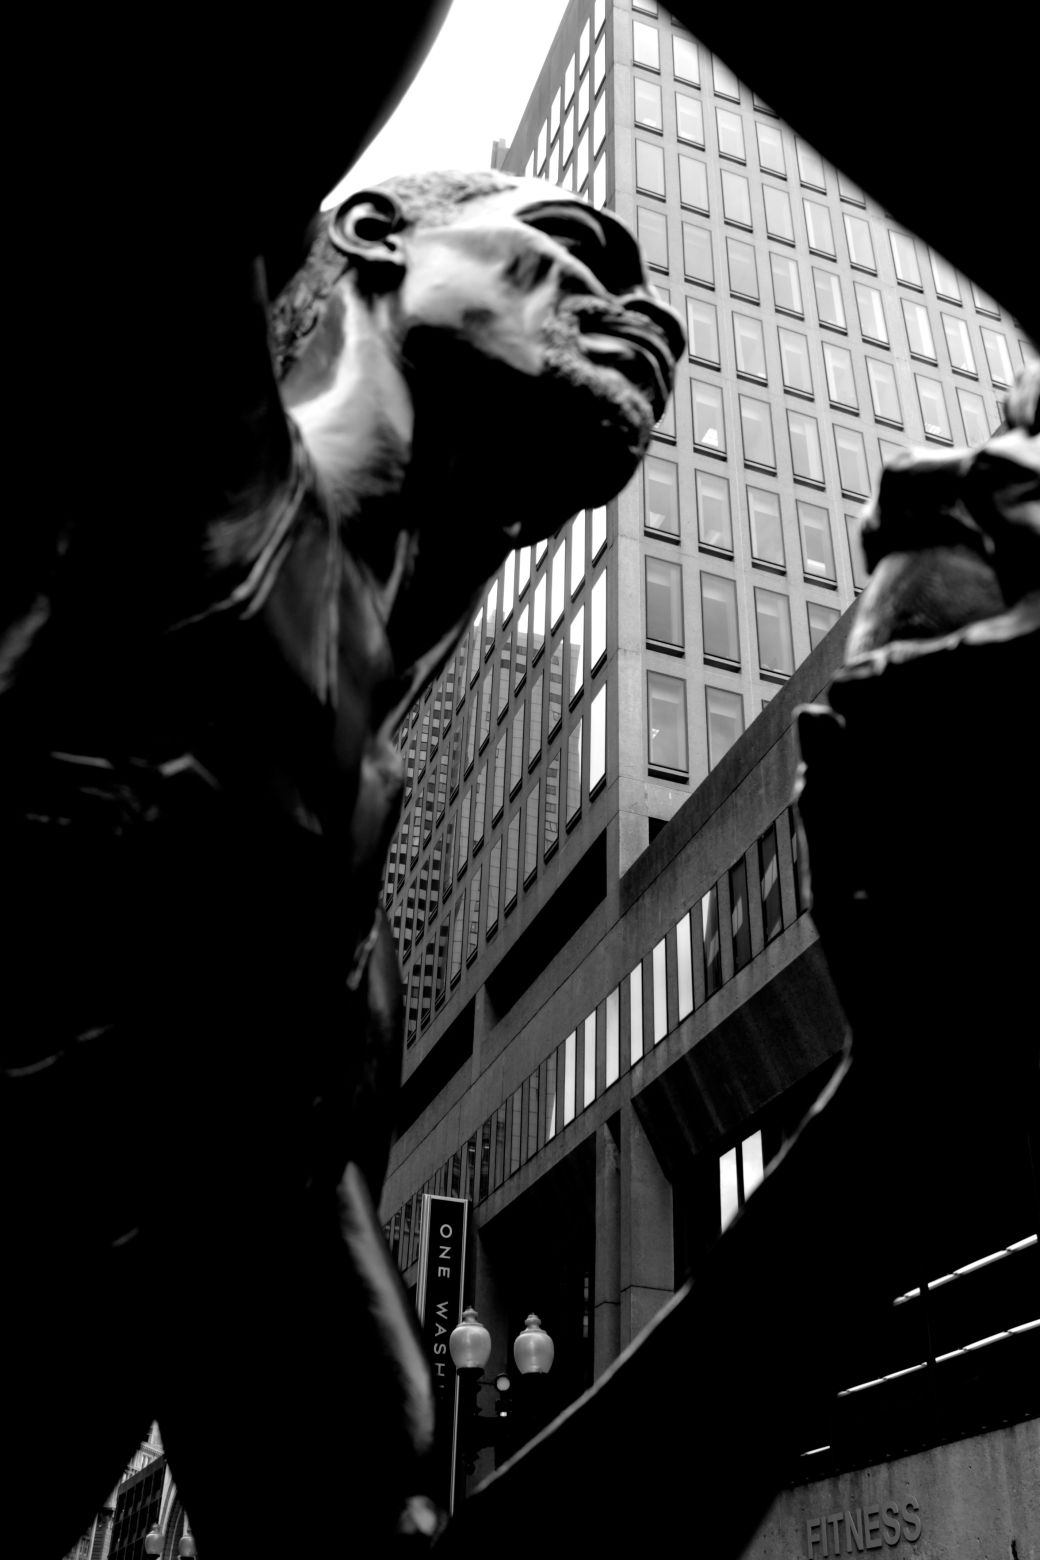 boston bill russell statue underneath